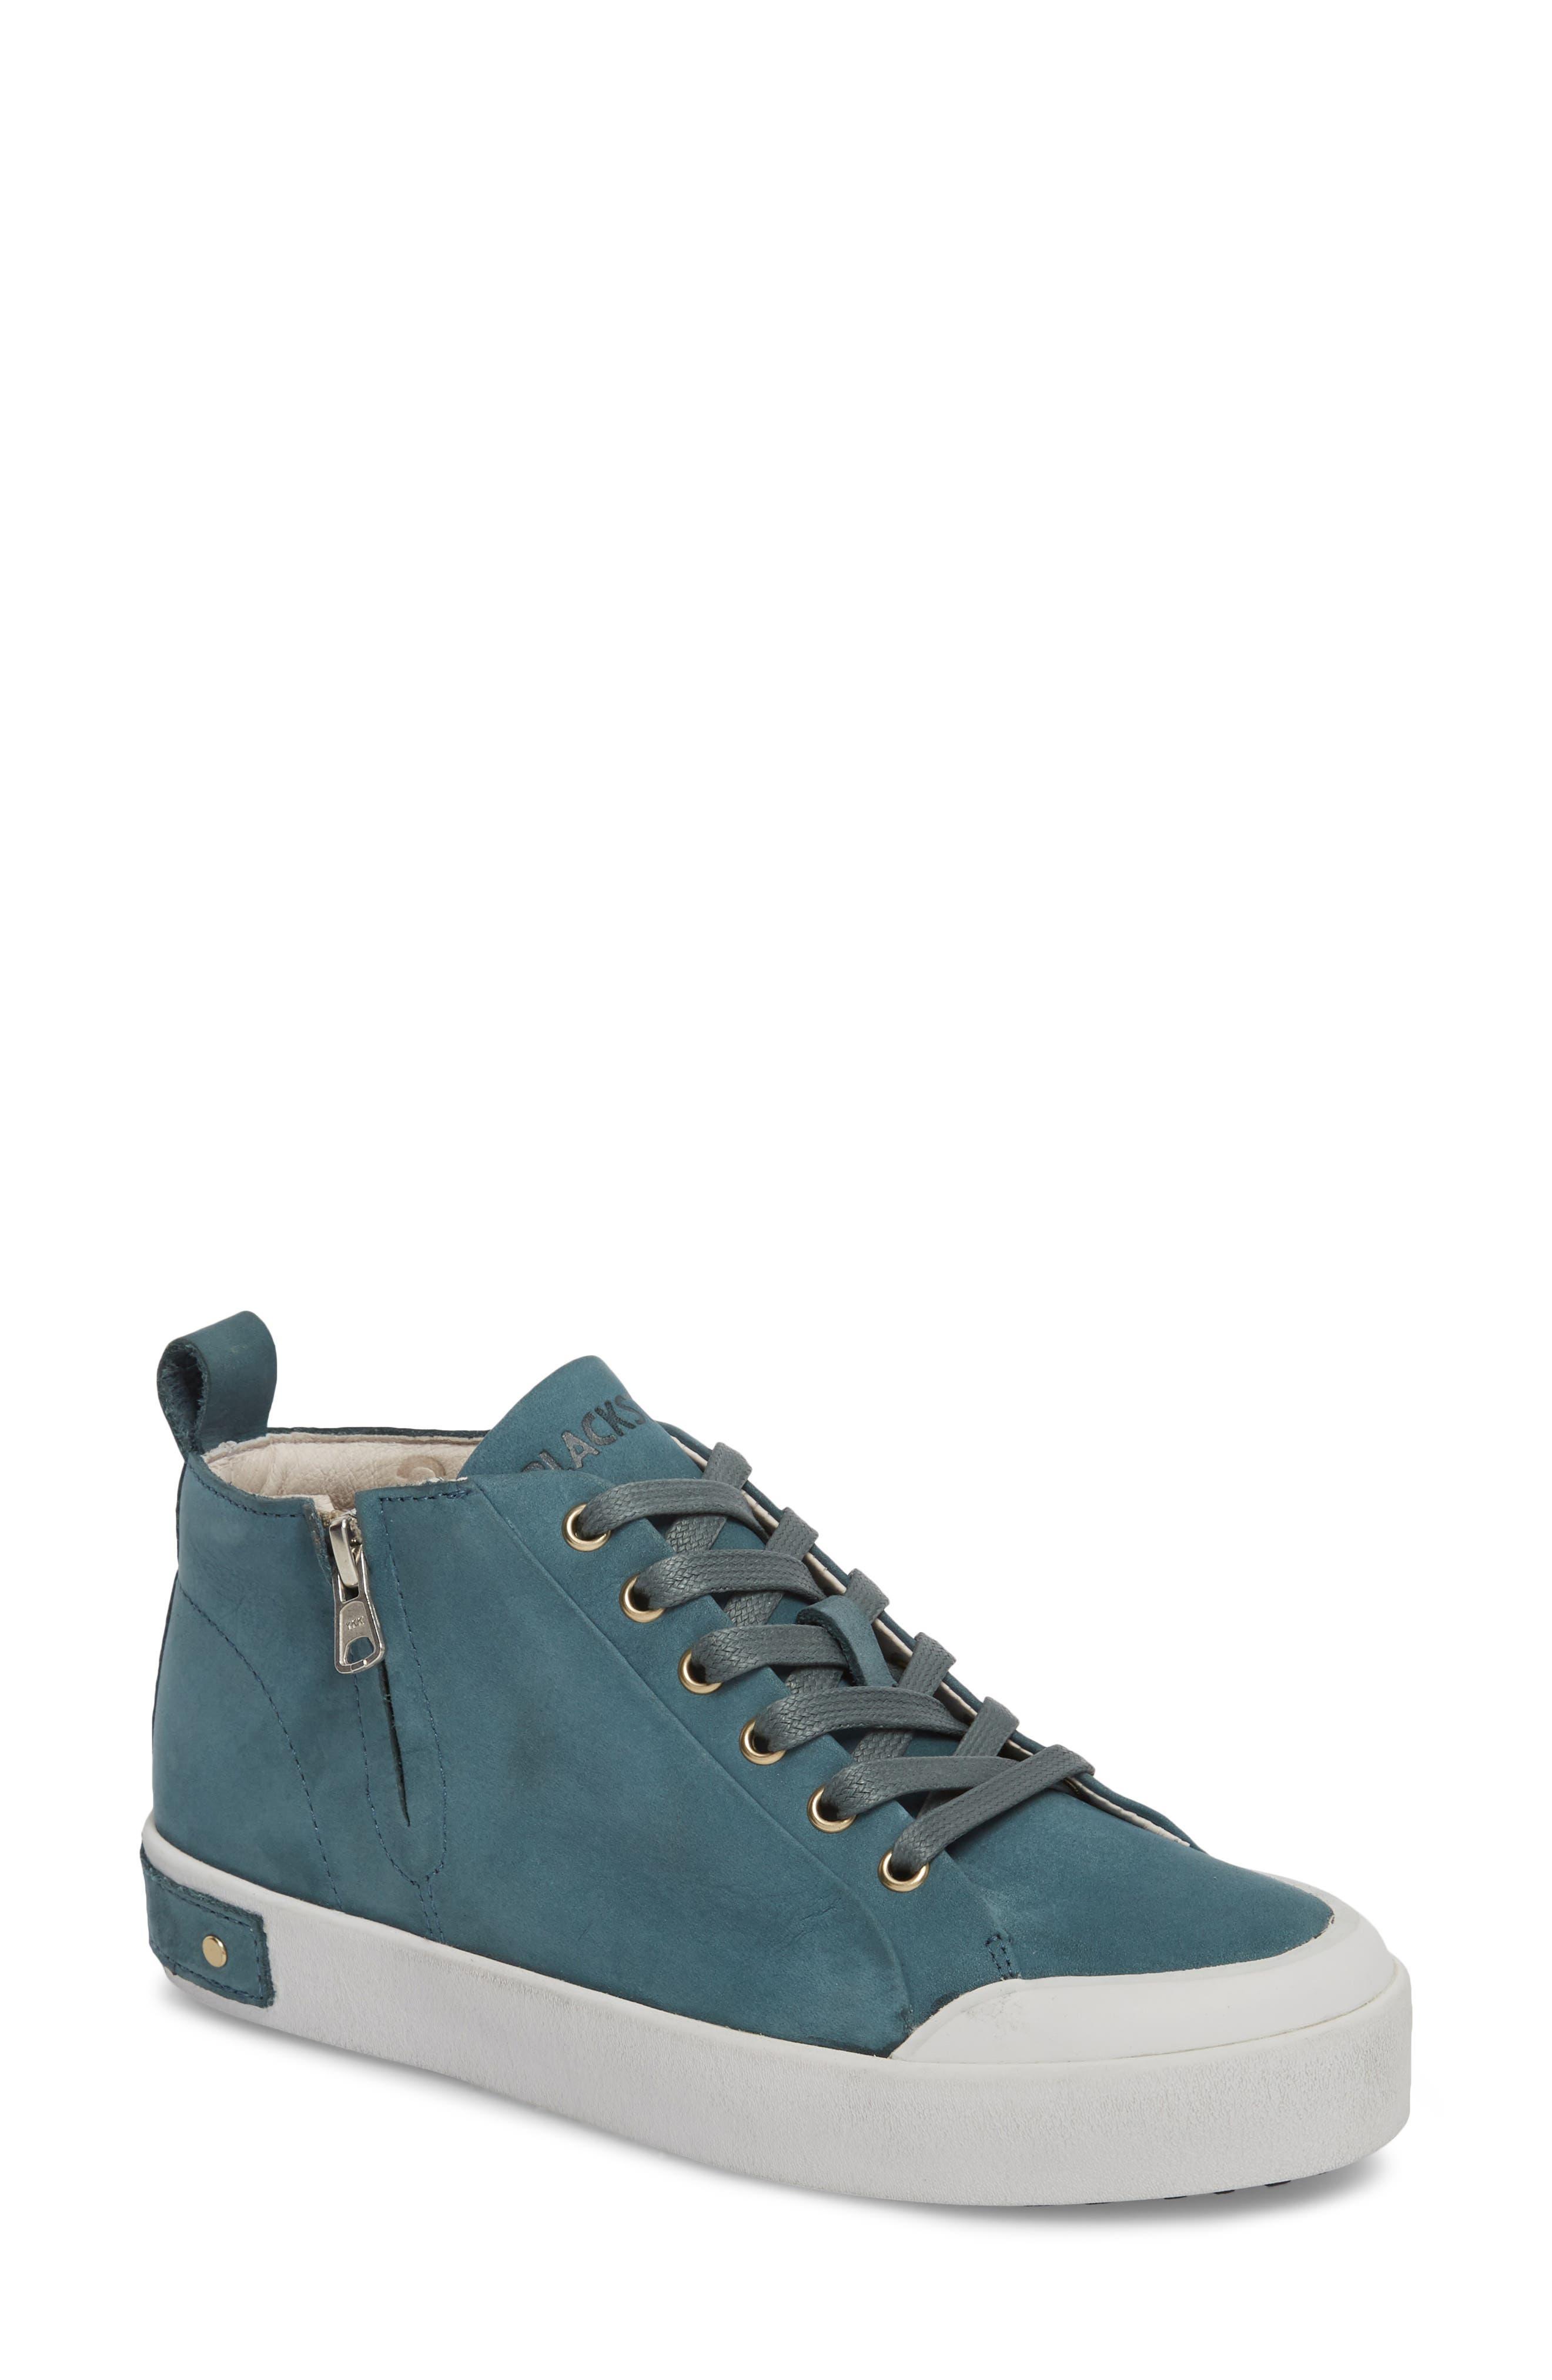 PL83 Mid Rise Sneaker,                         Main,                         color, Mallard Blue Leather